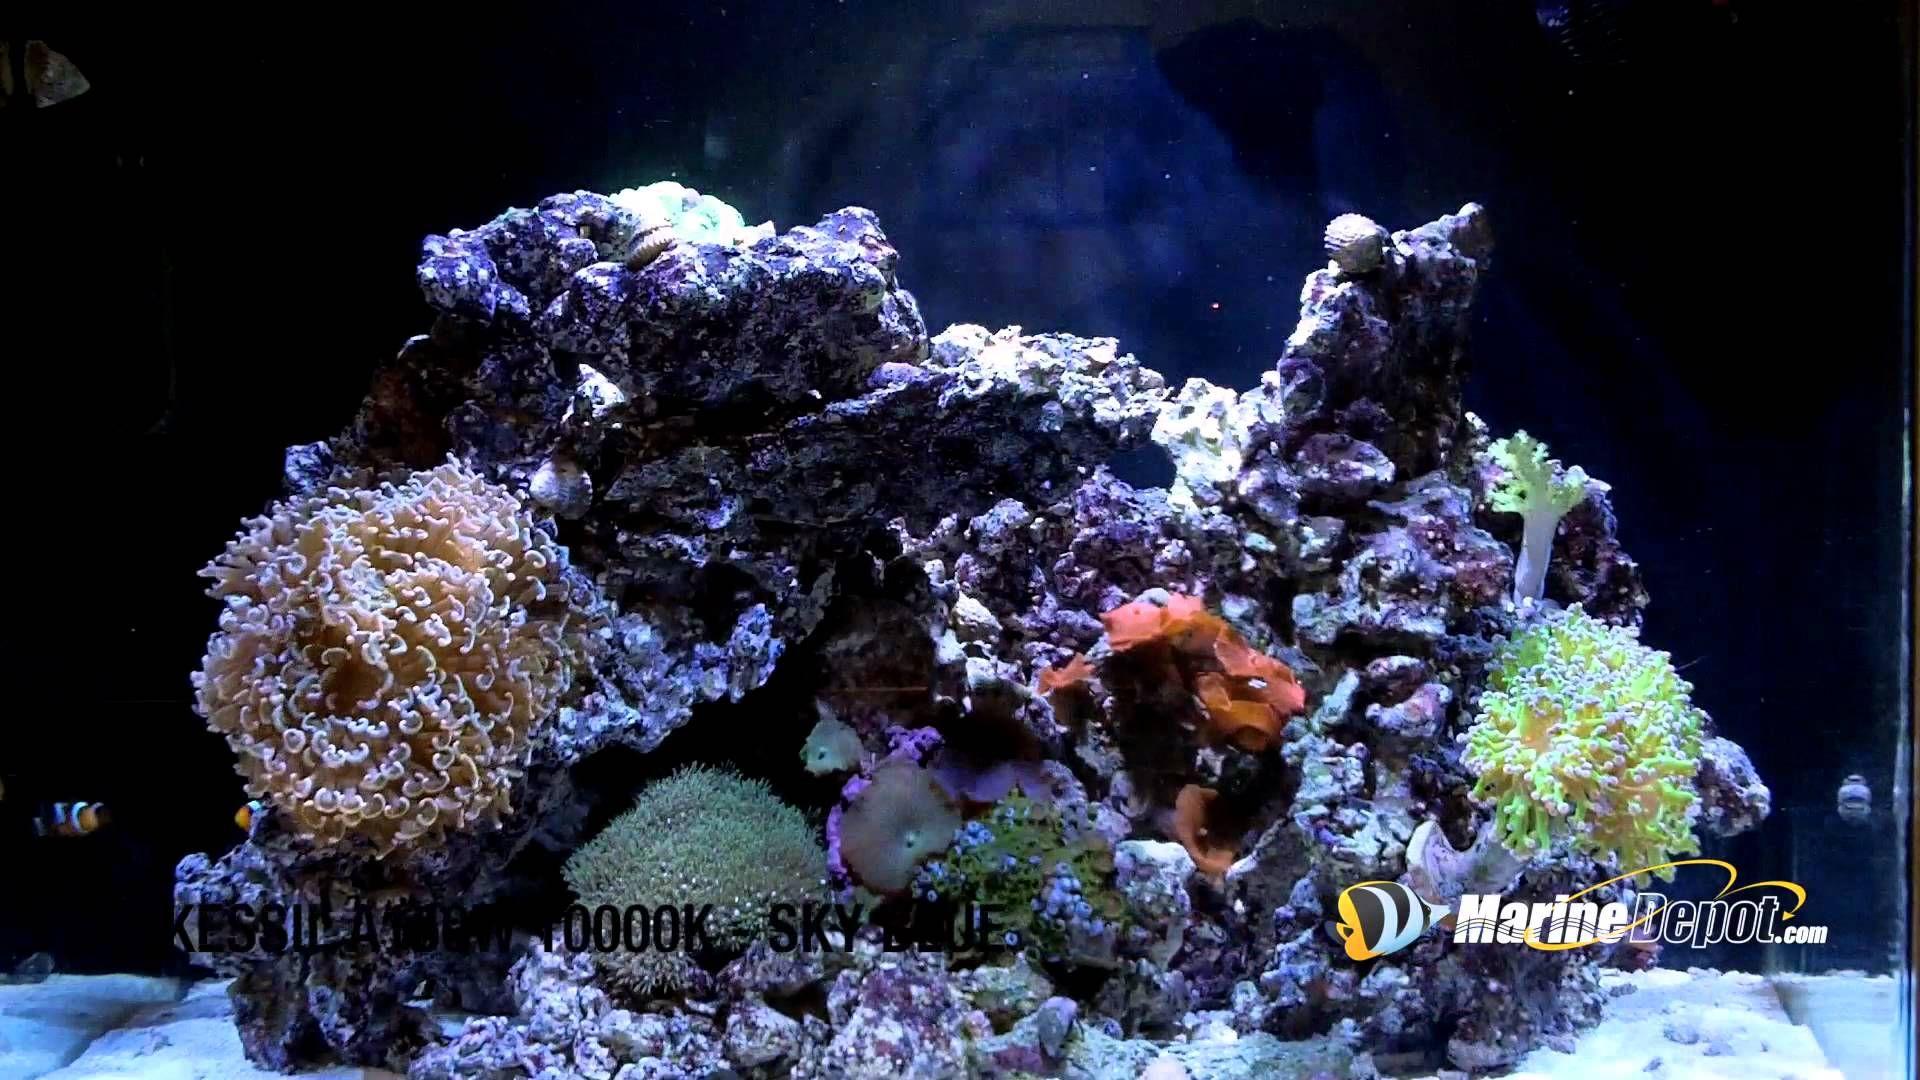 kessil a150w special blend led aquarium light product demo marine